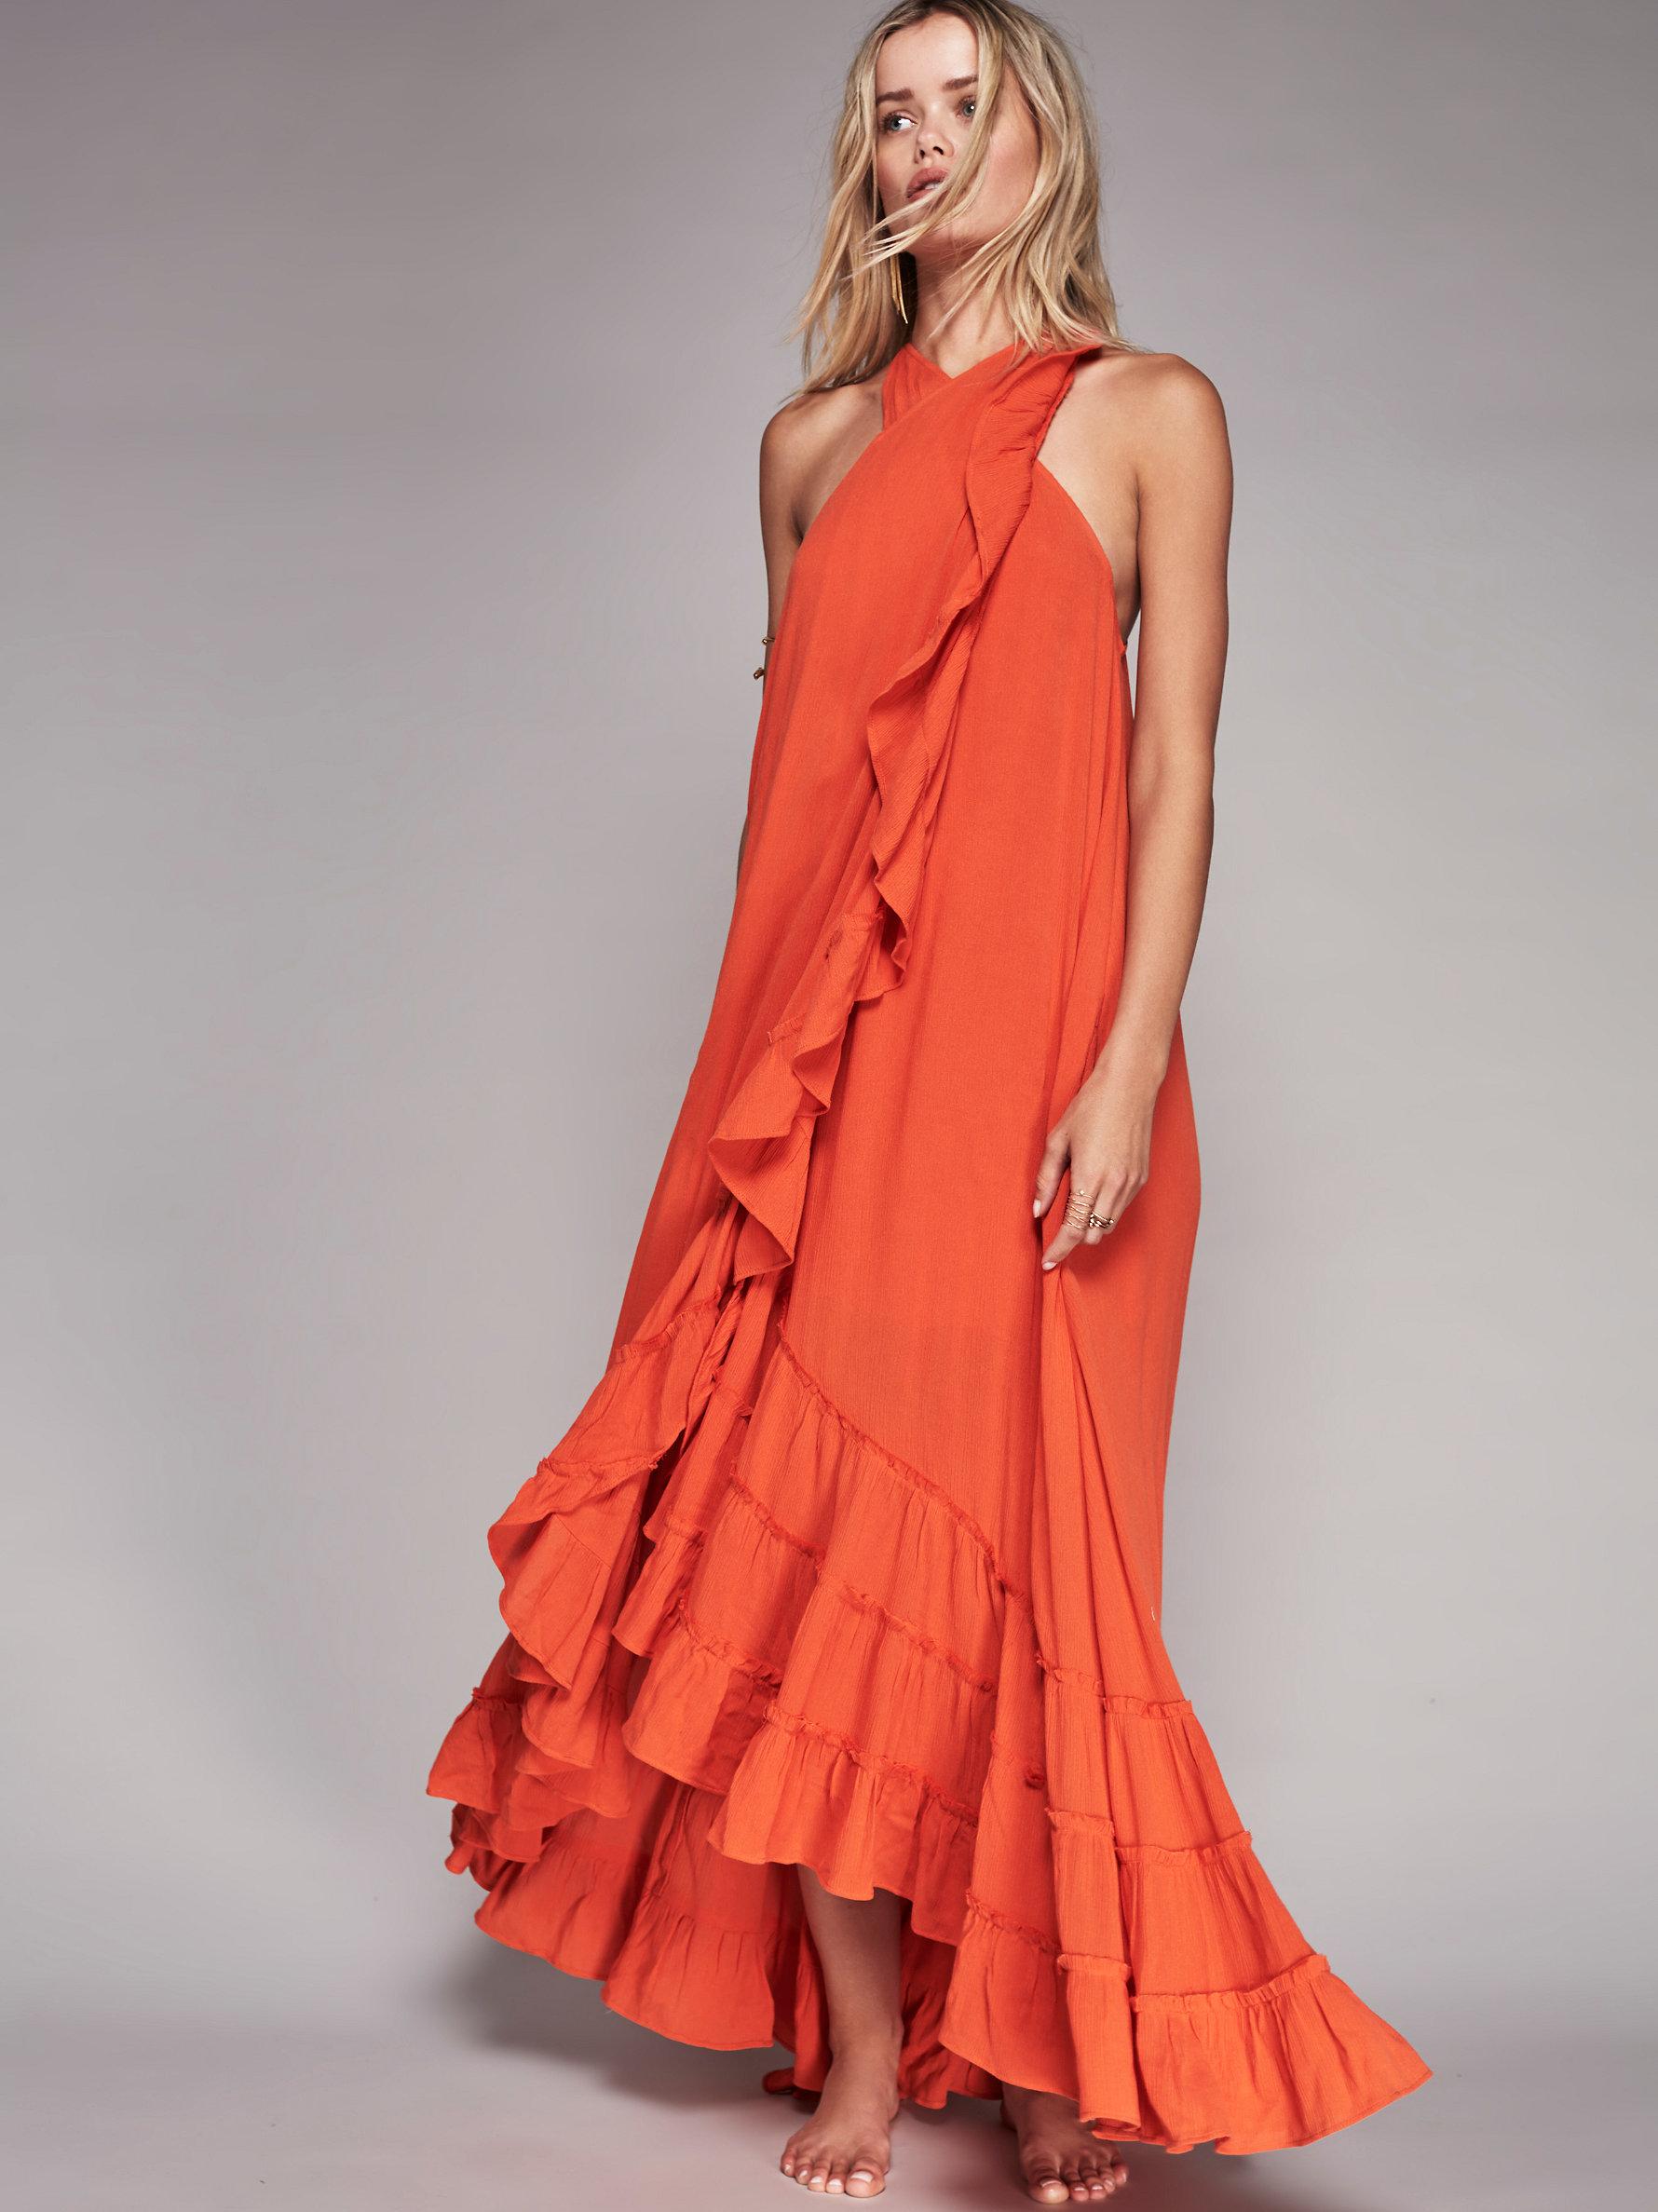 Free People Wrap Around Maxi Dress In Orange Lyst